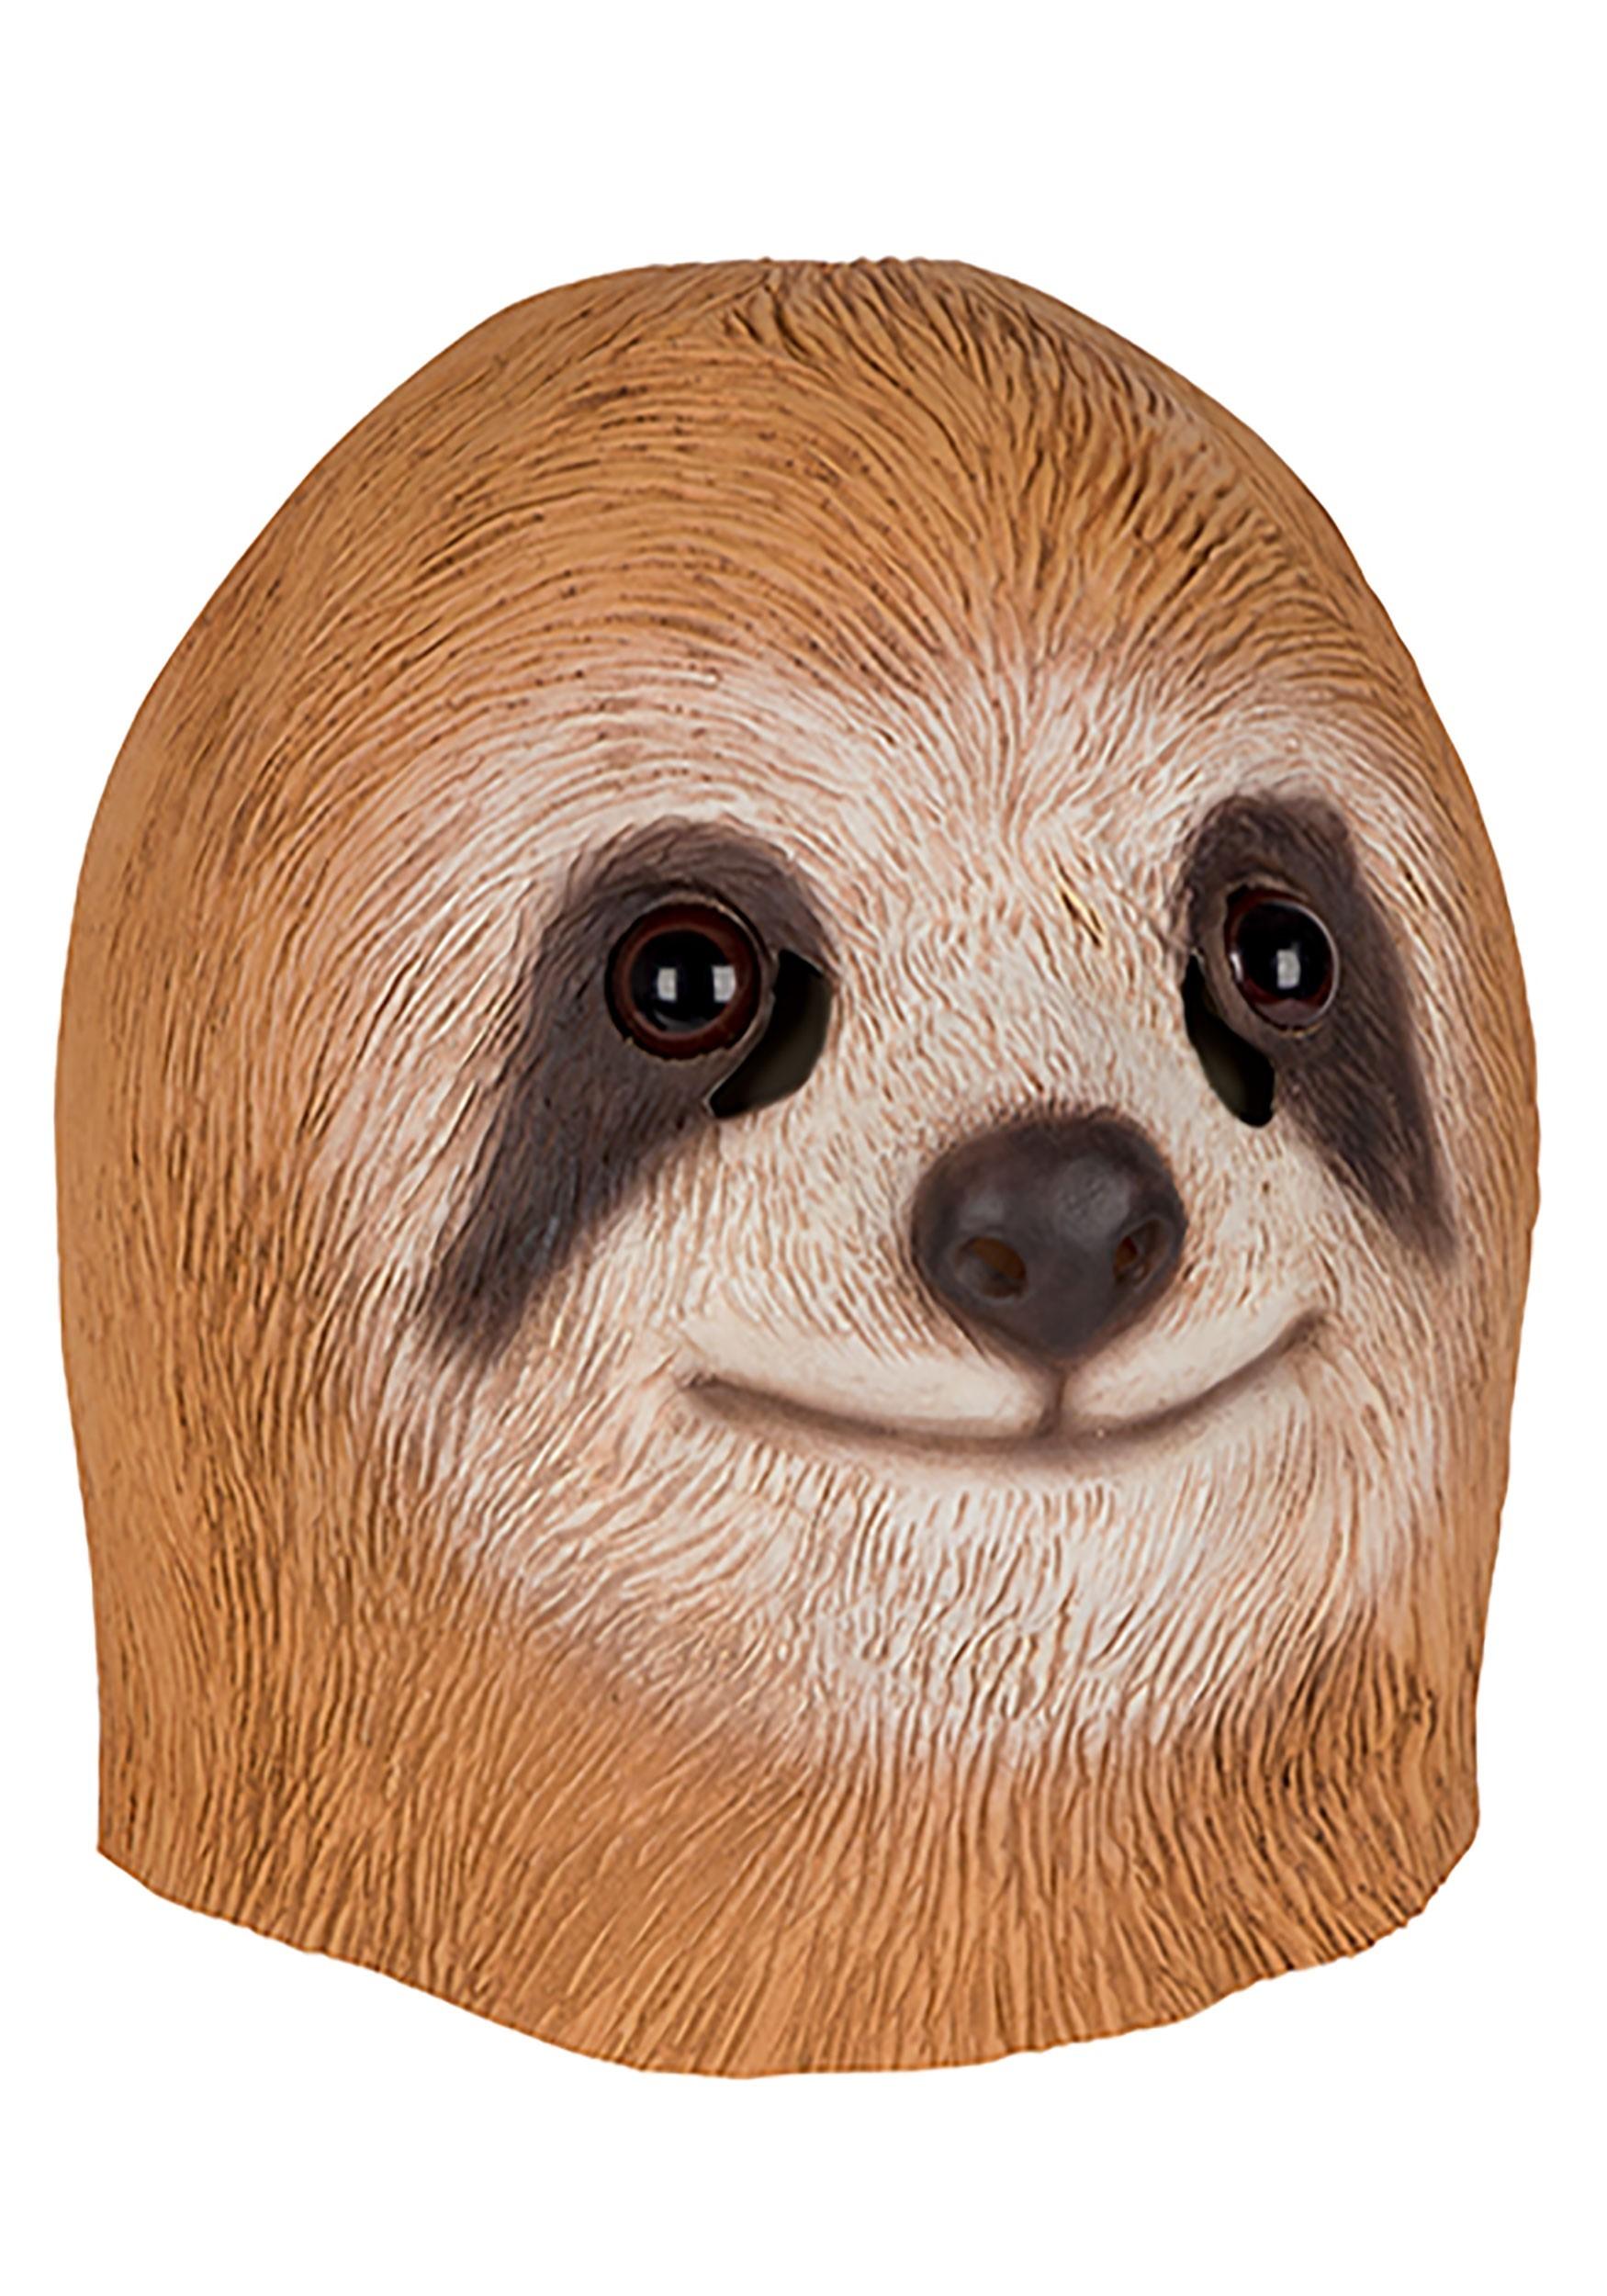 Smiling_Sloth_Mask